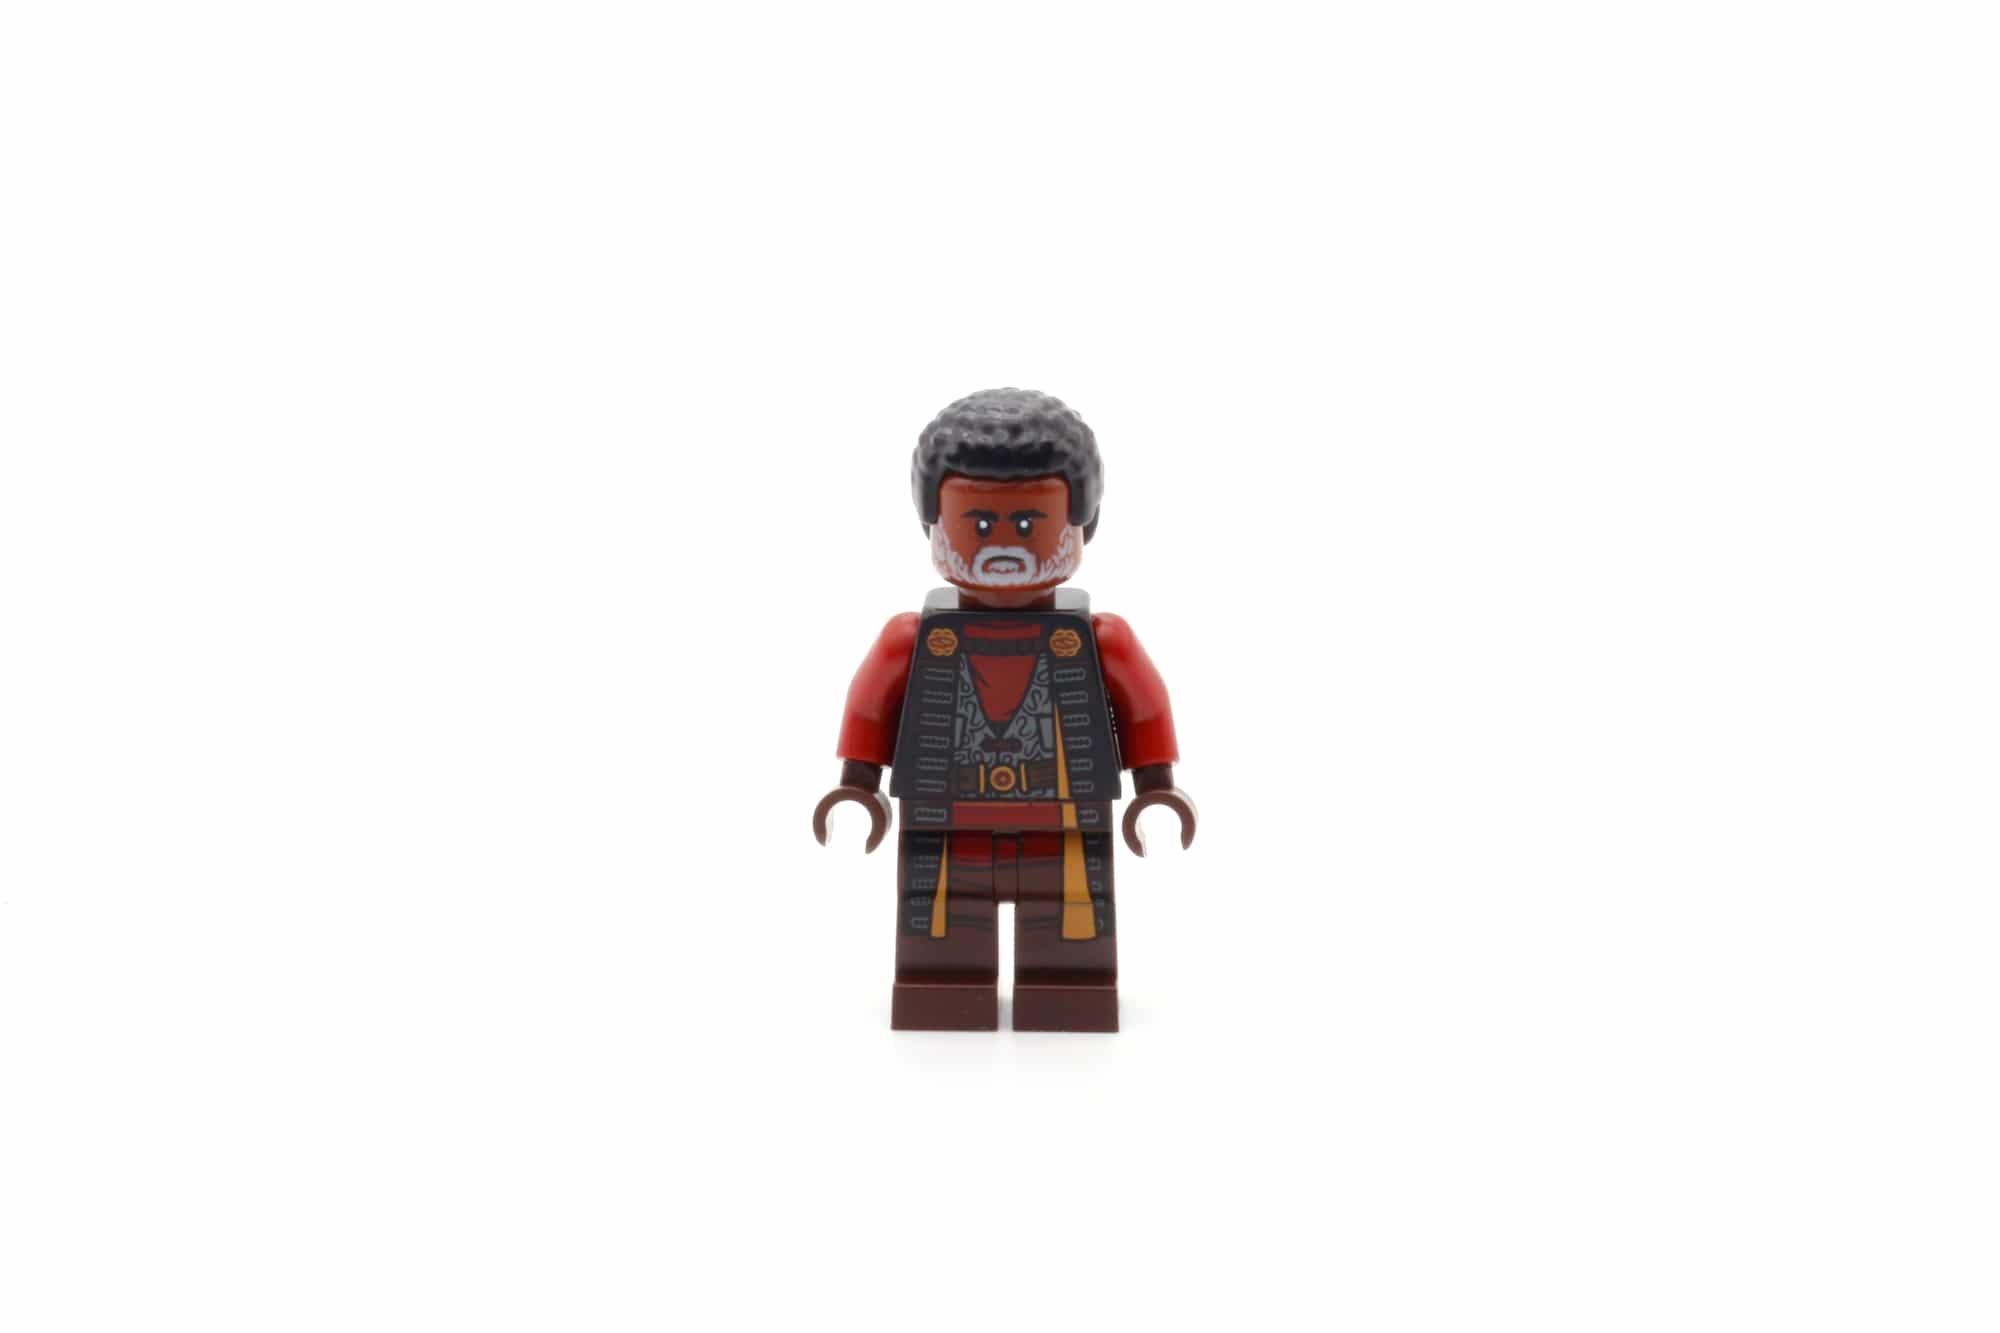 LEGO Star Wars 75311 Imperial Marauder Greef Karga Front